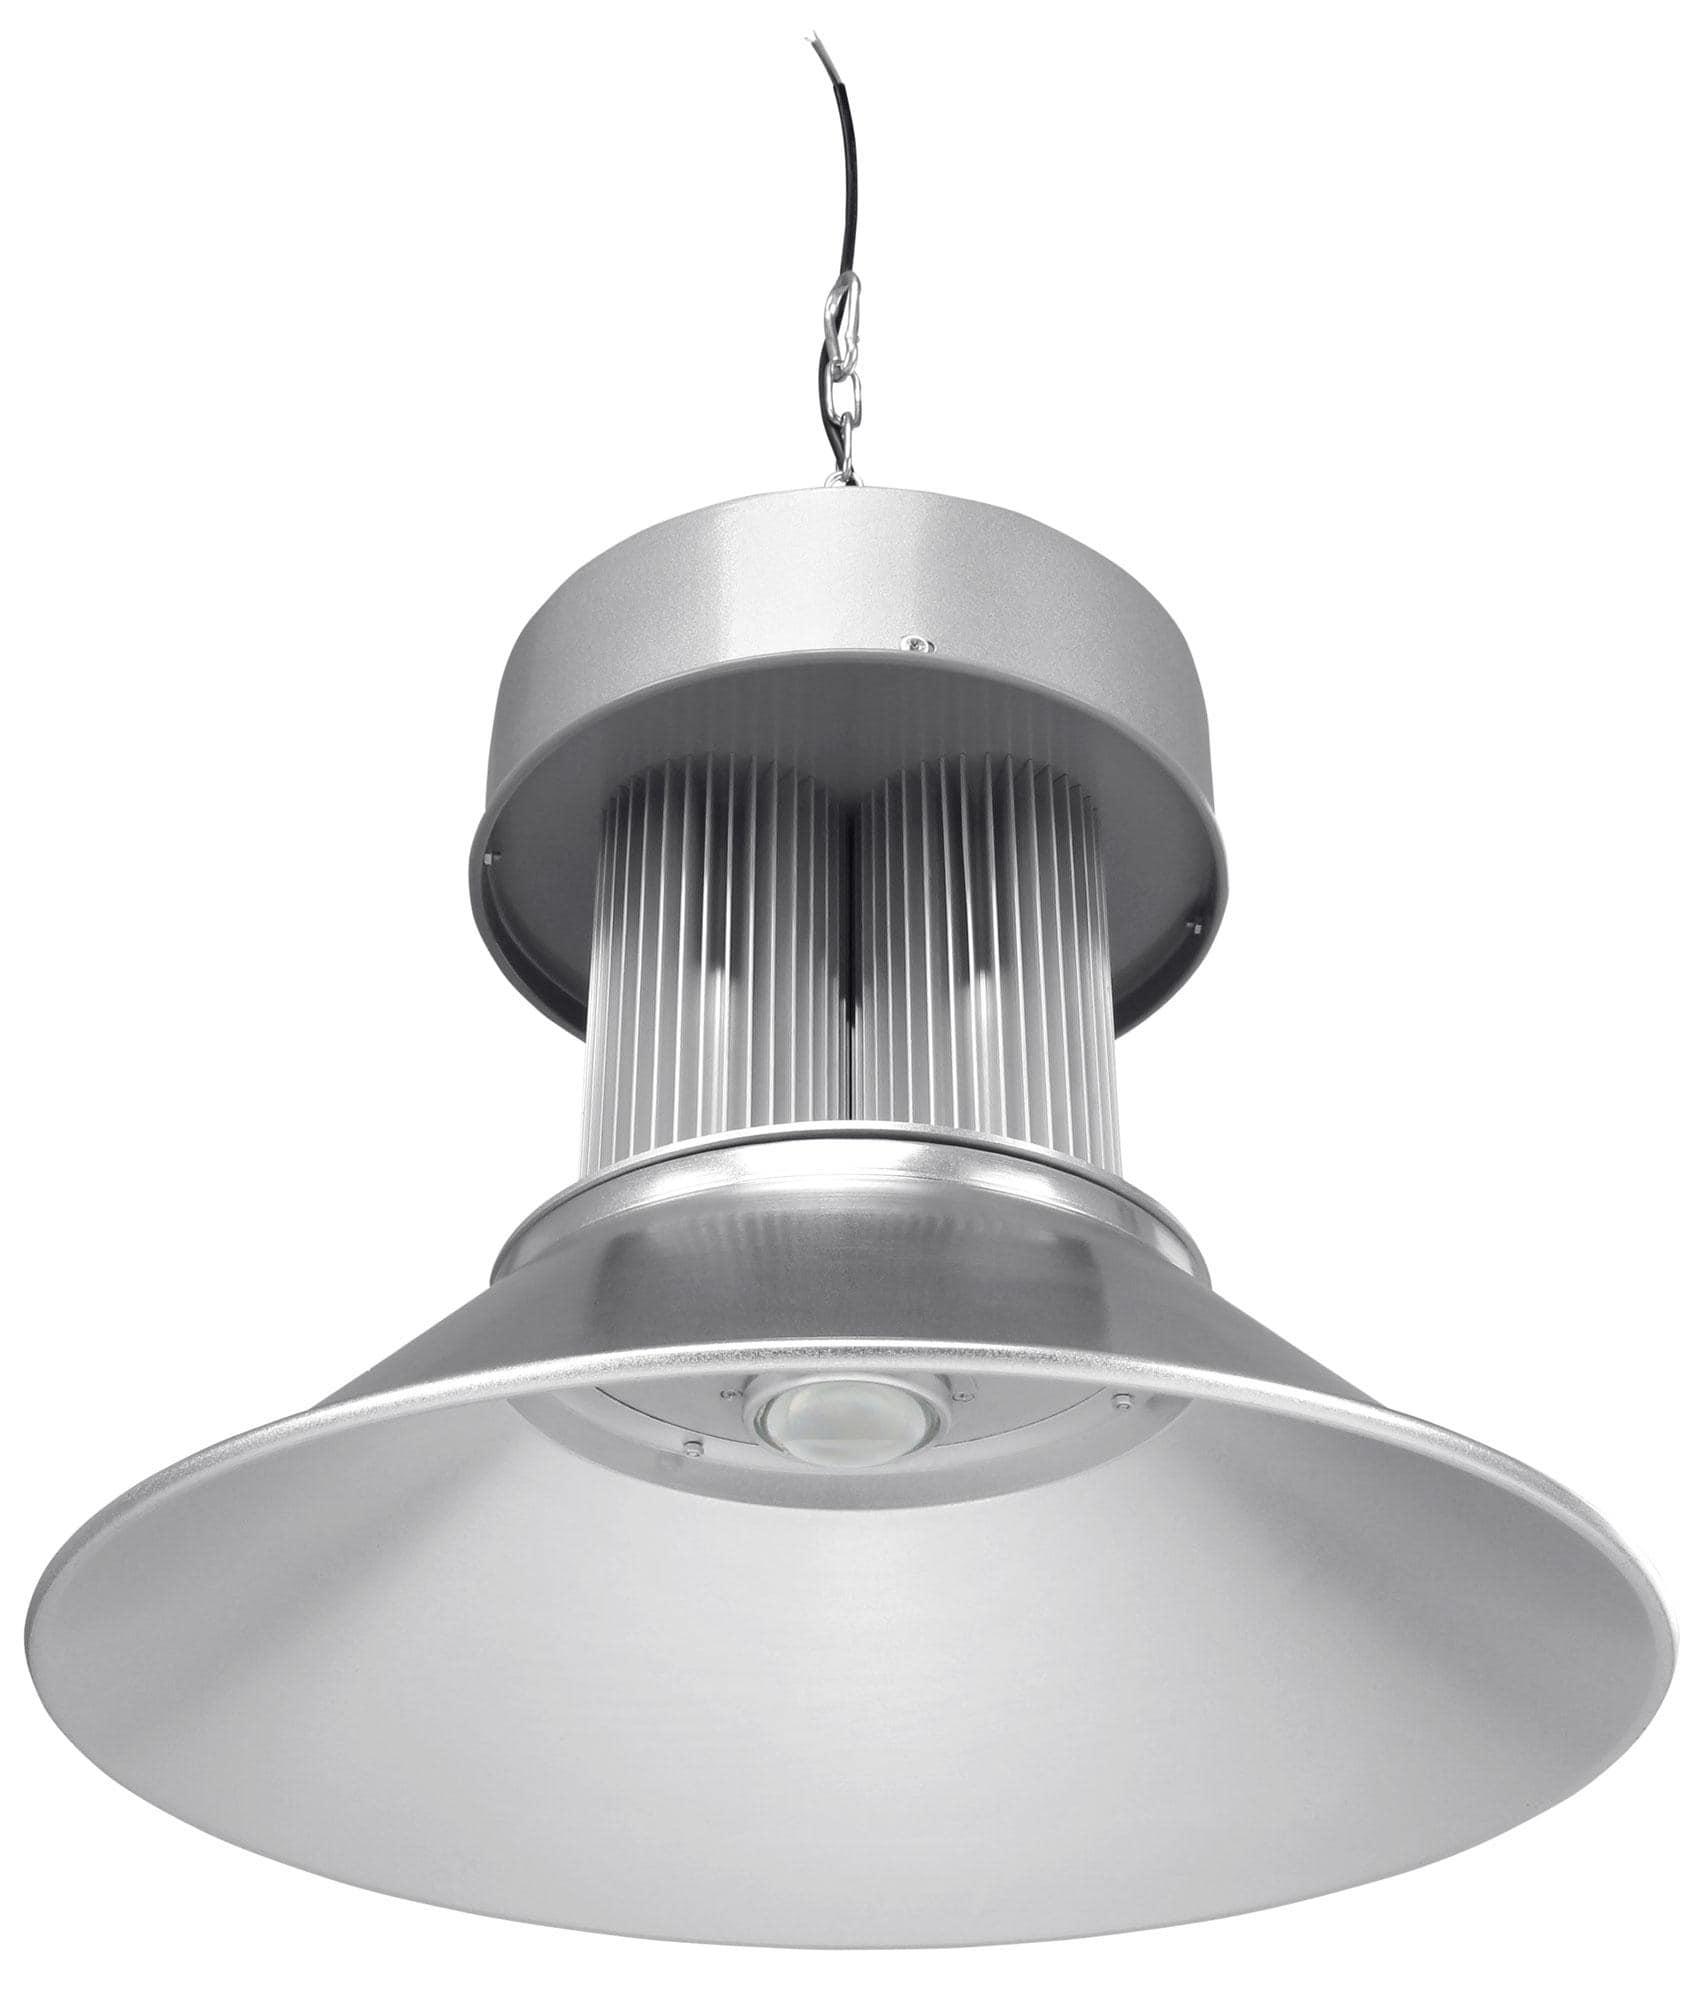 2x Showlite HBL-100 COB LED High Bay Hanging Spotlight 100W